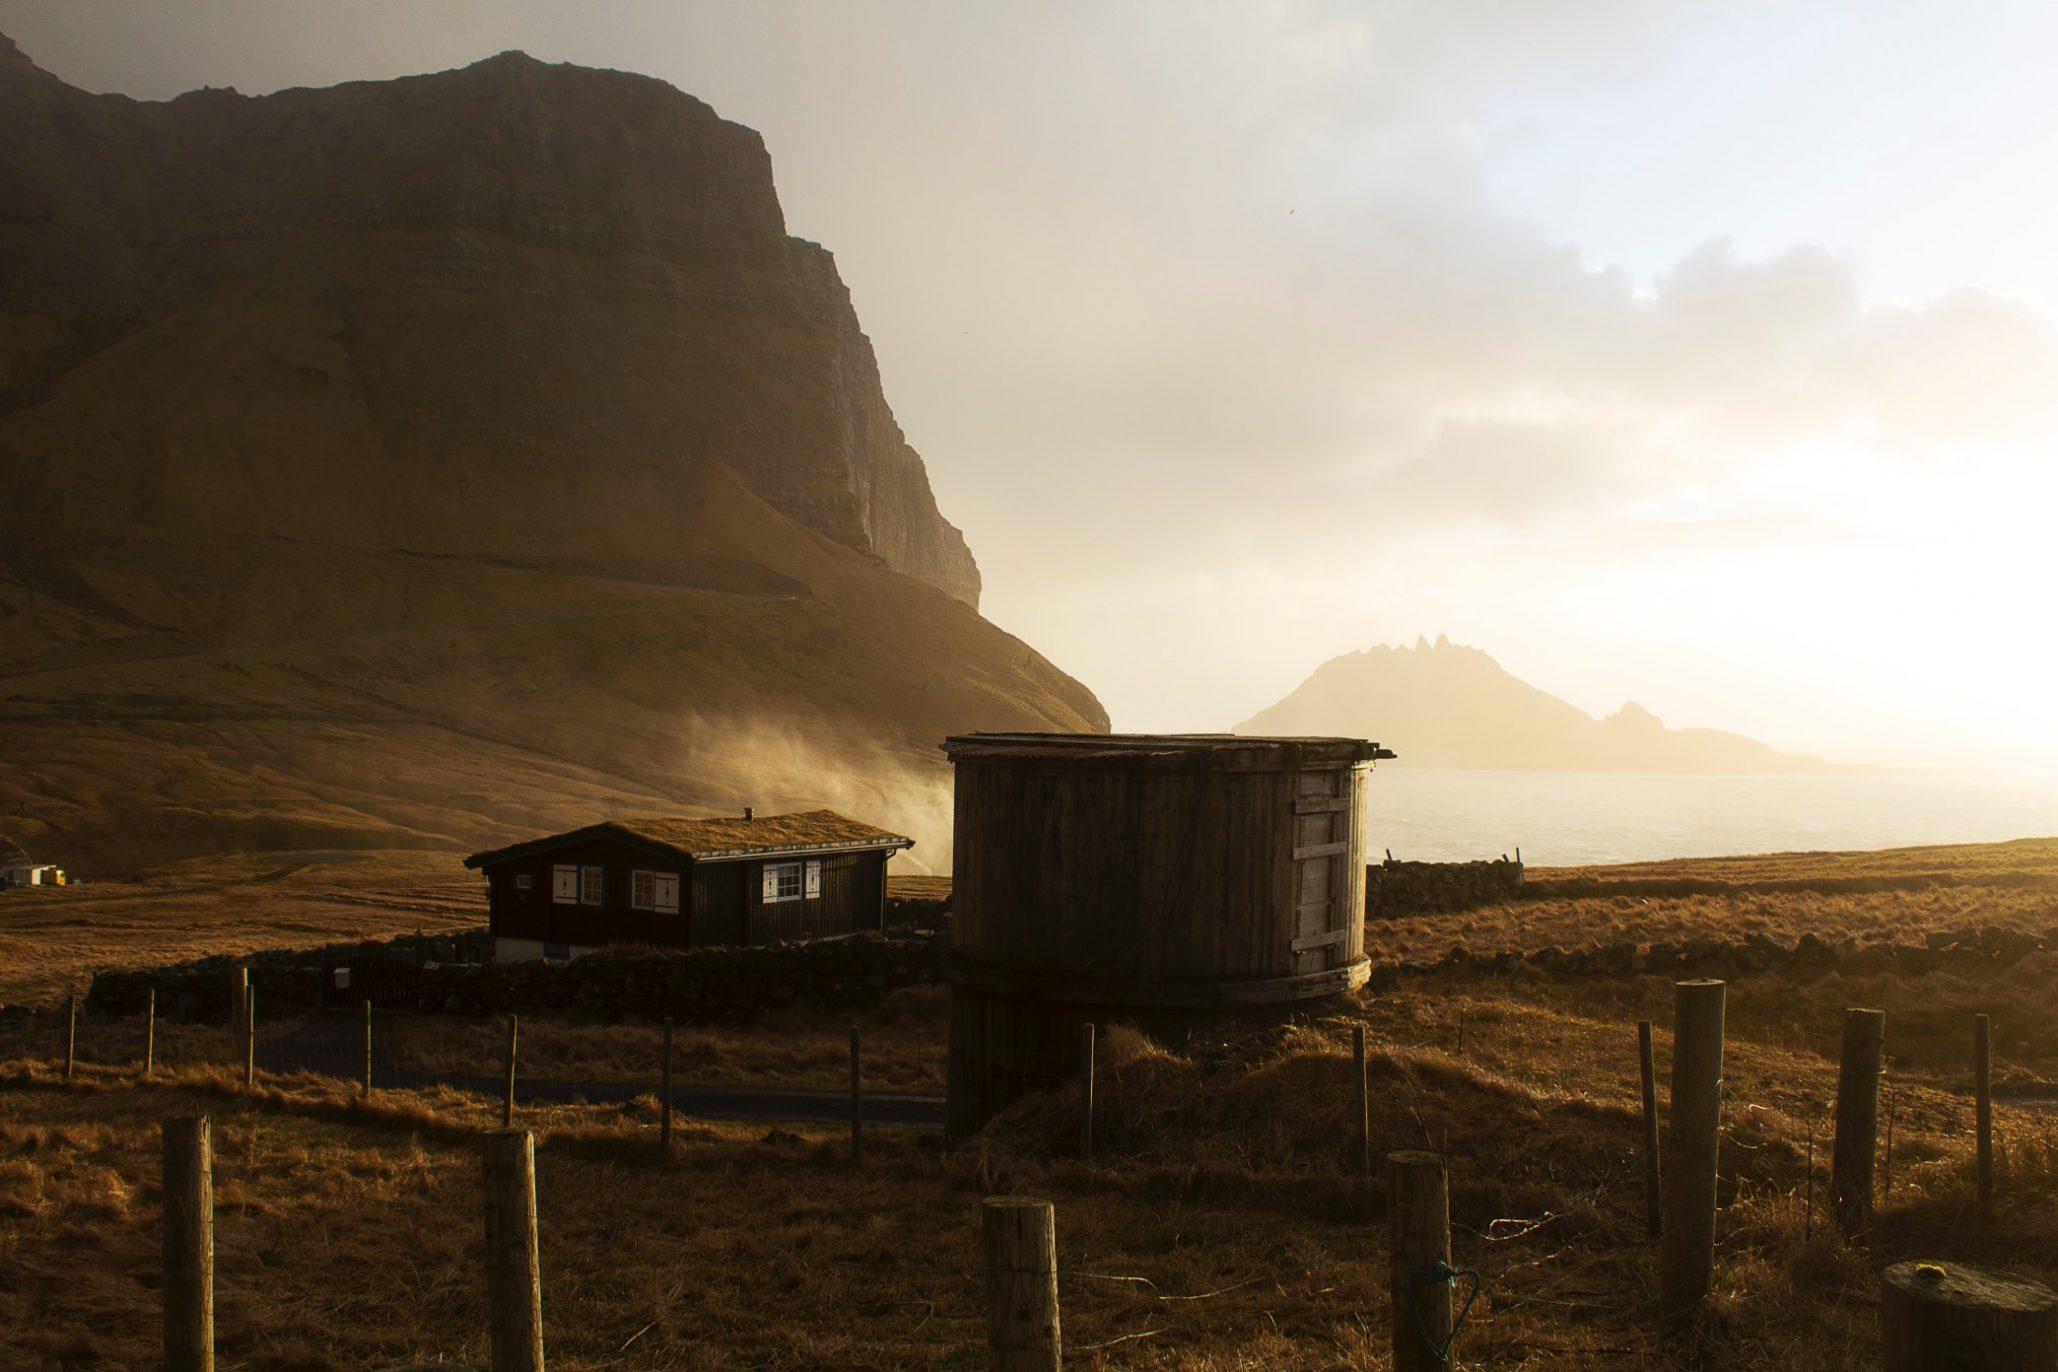 Faerské ostrovy - dedina Gásadalur